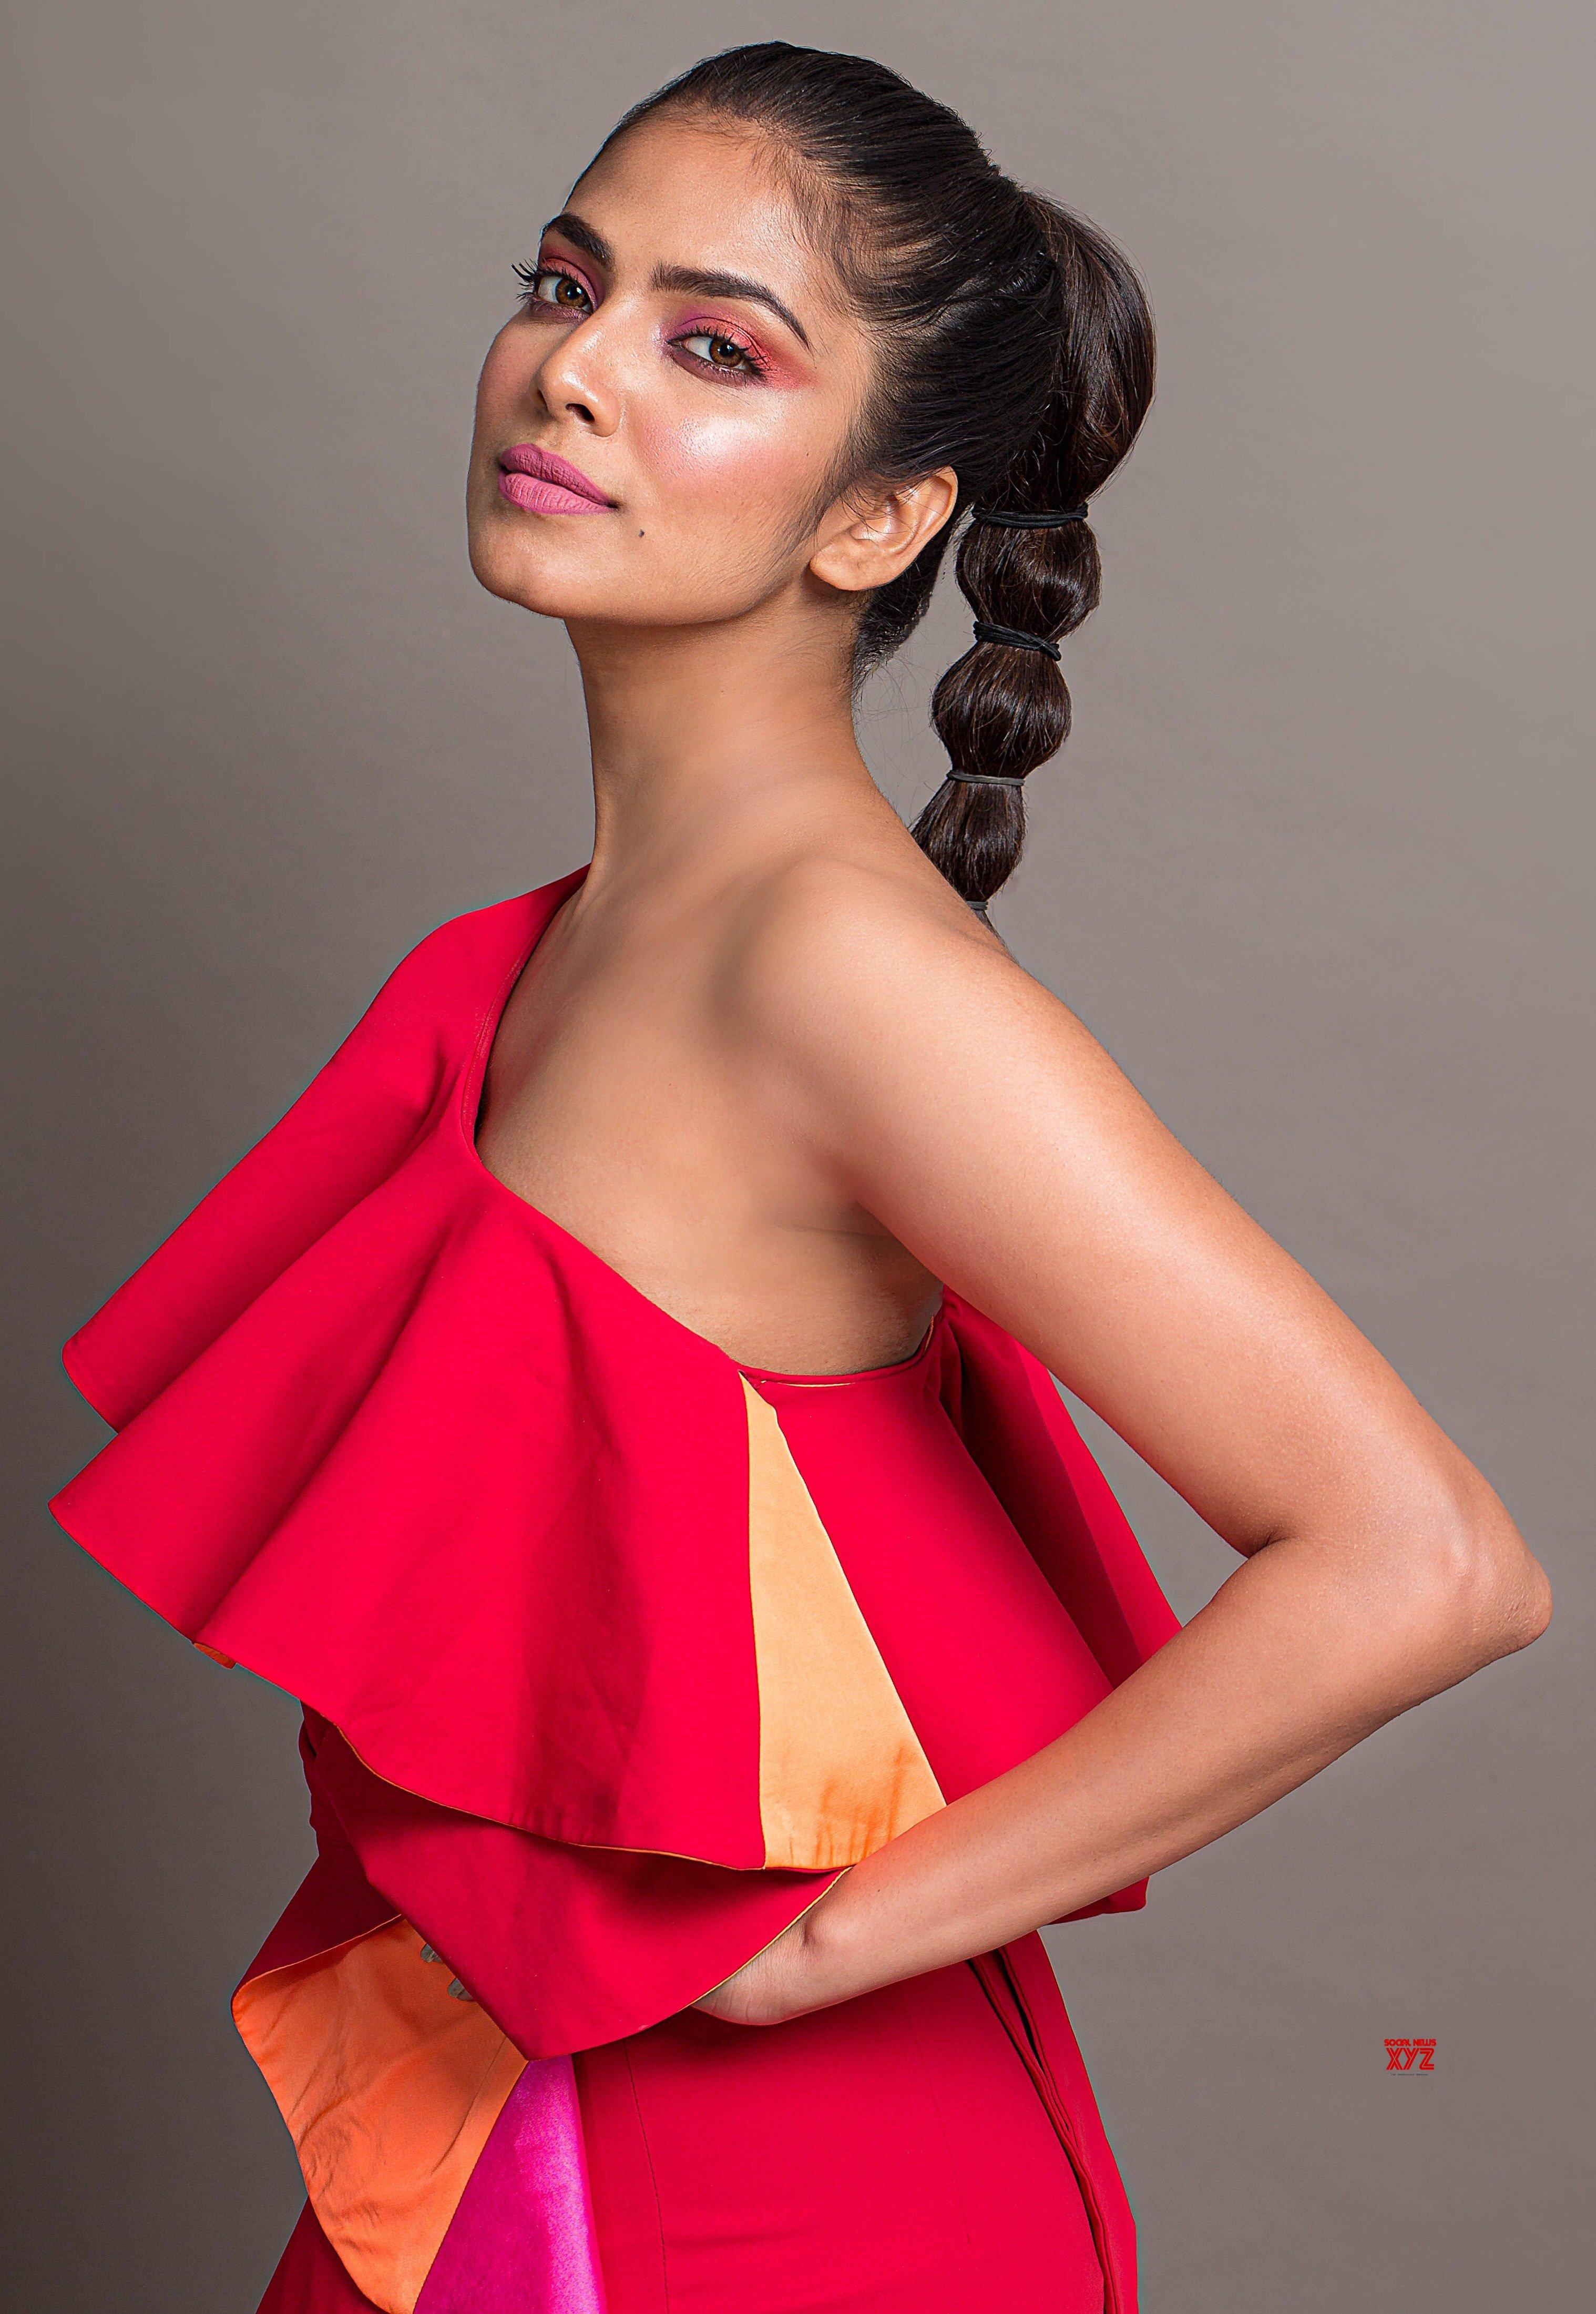 Actress Malavika Mohanan Looks Red Hot In Her Latest HD Stills